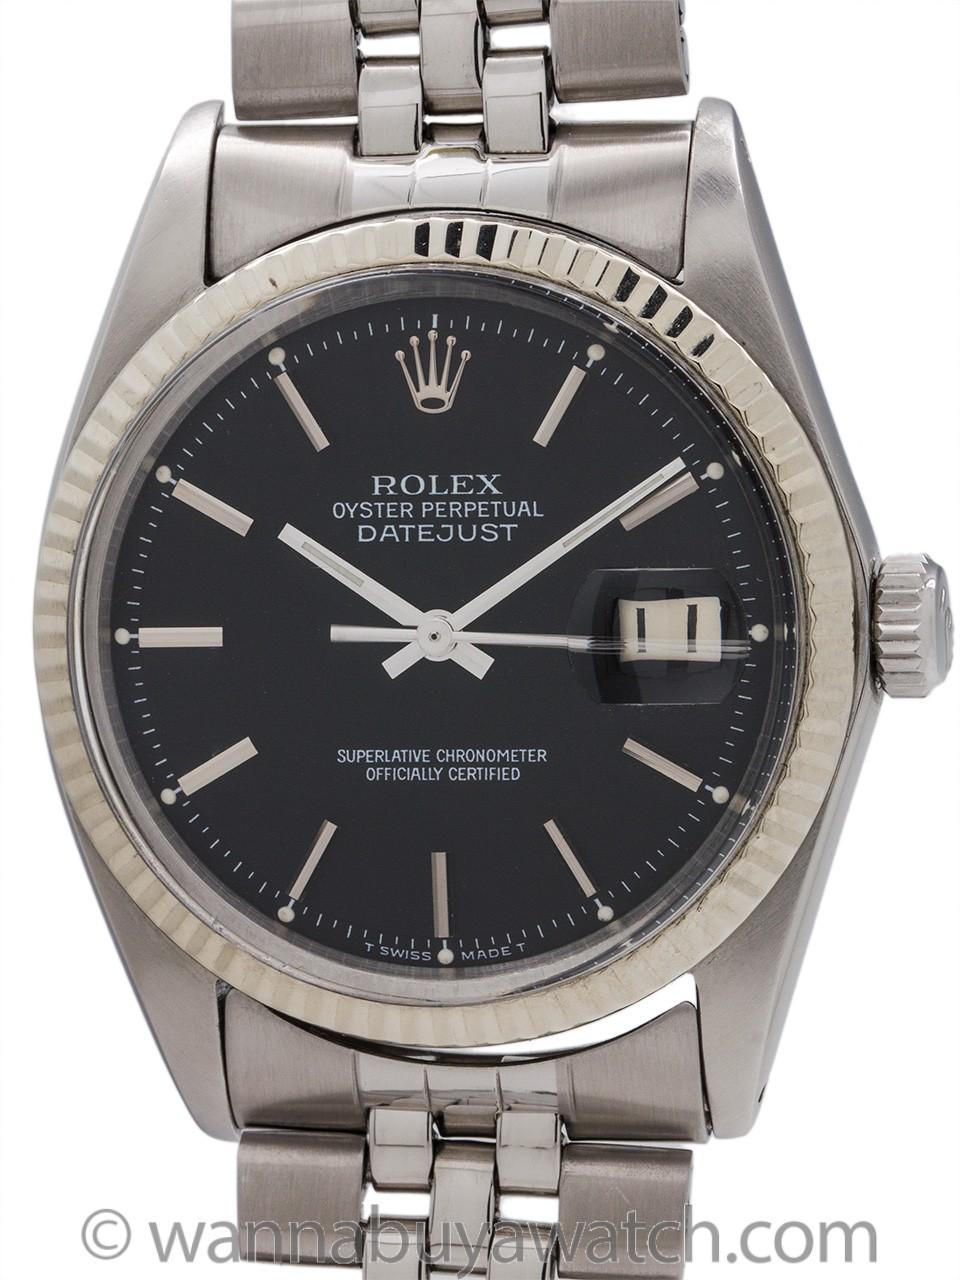 Rolex Datejust ref 1601 Black Pie Pan Dial circa 1965